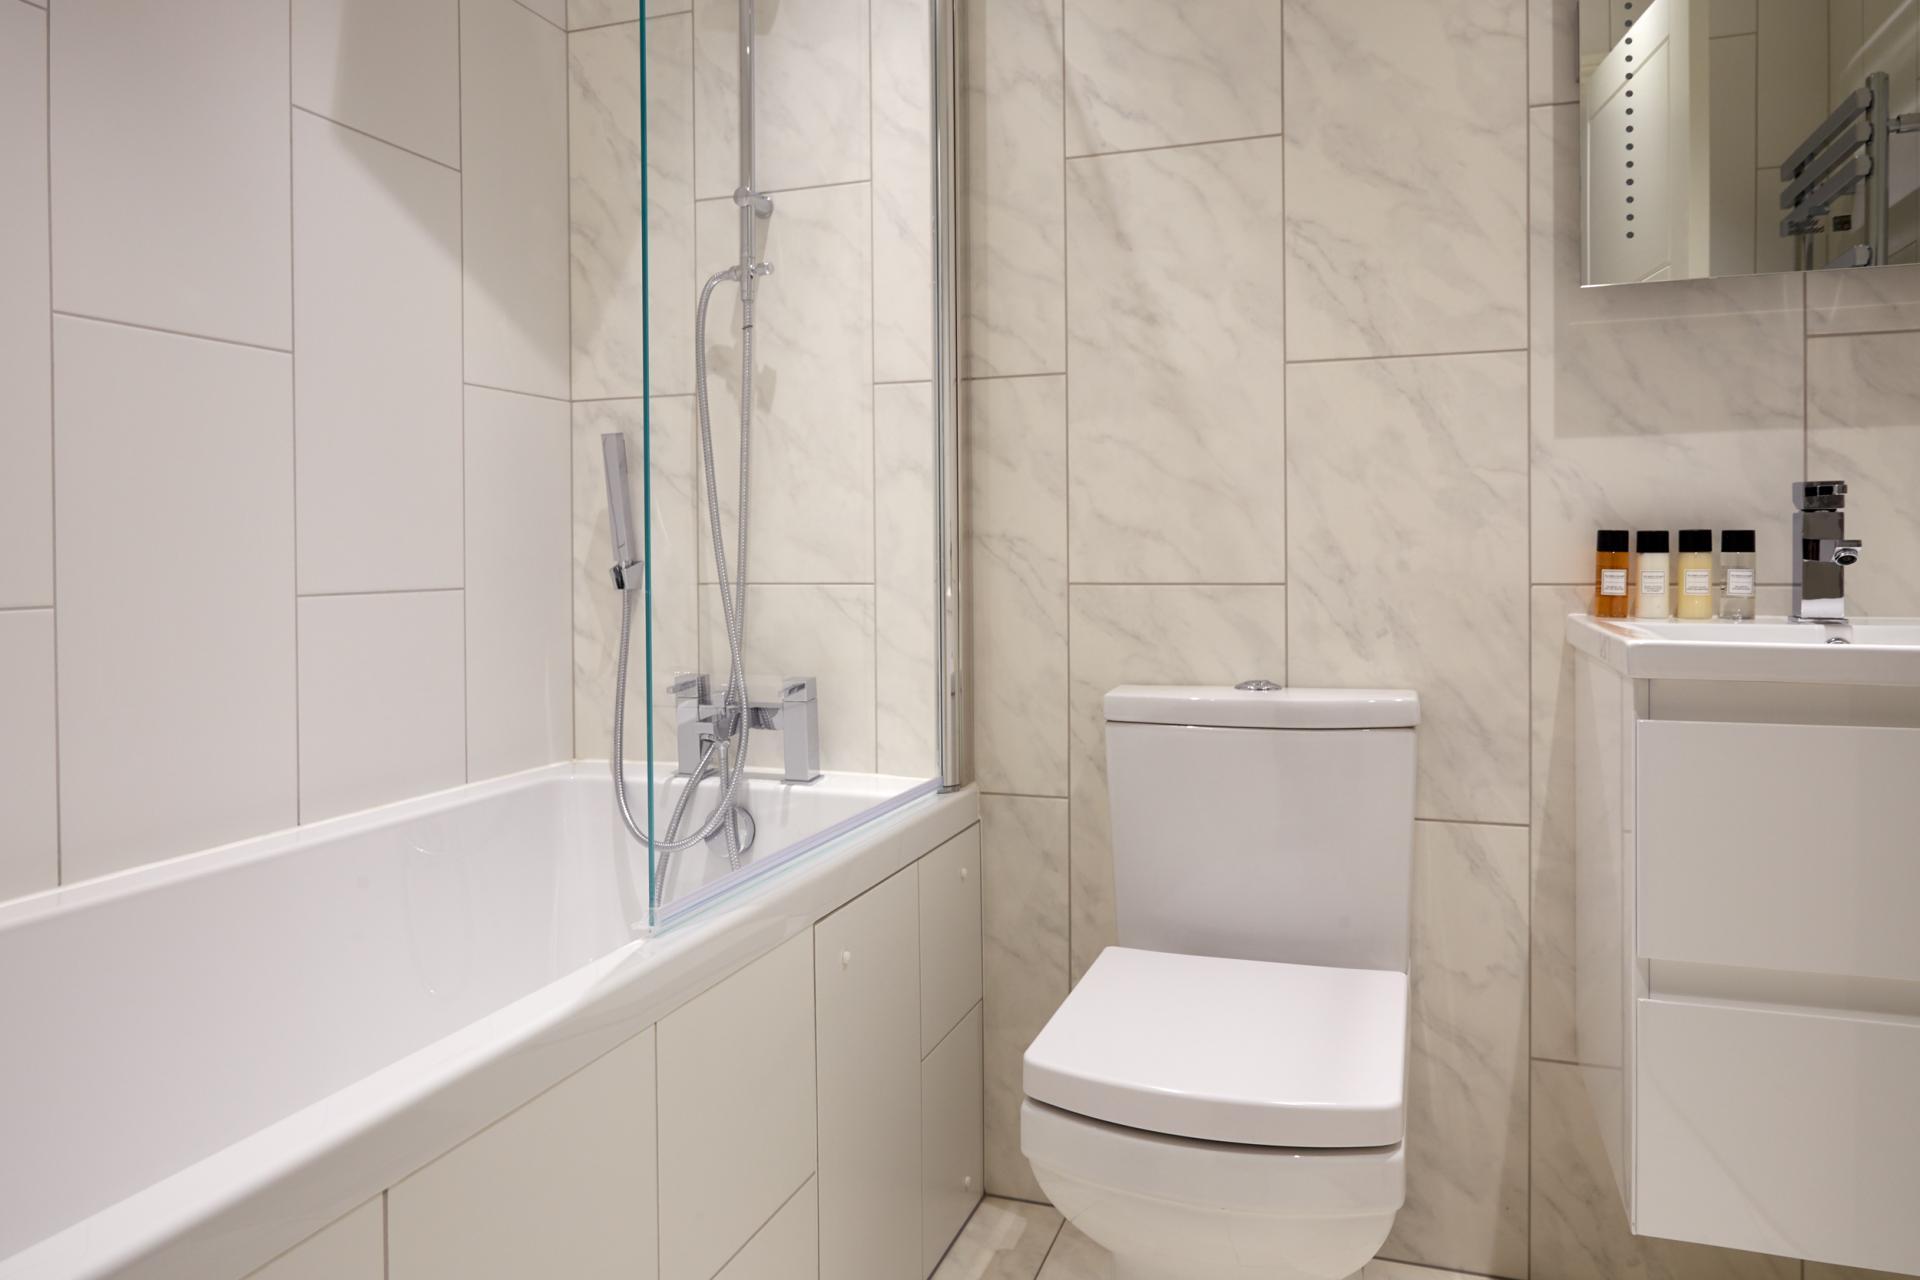 Bathroom at Virginia House Apartments, Fitzrovia, London - Citybase Apartments